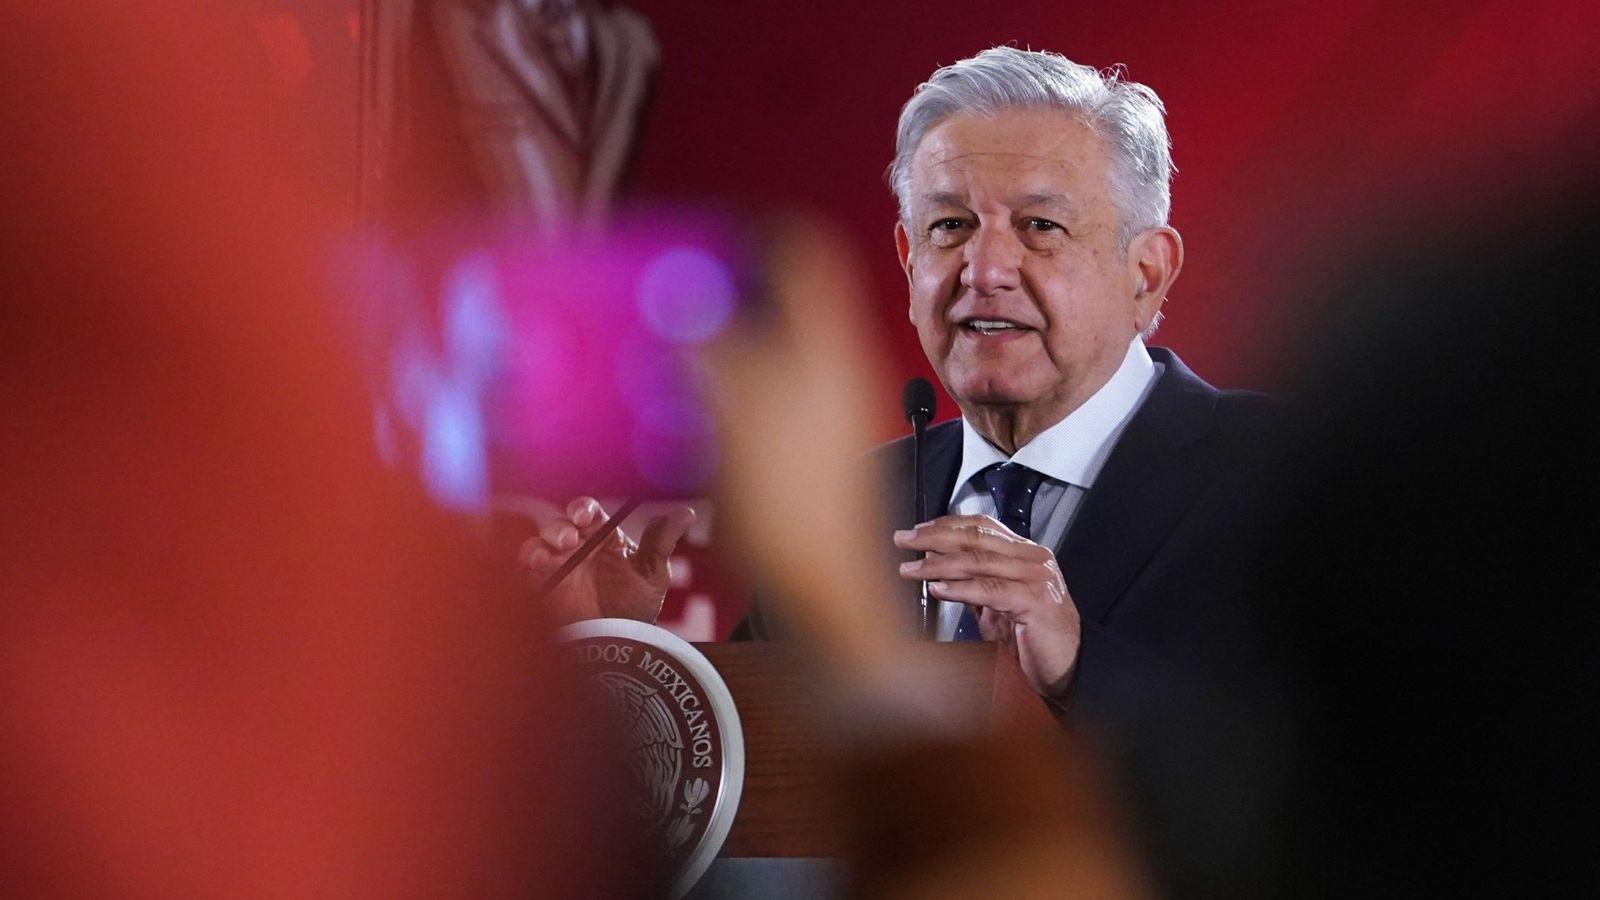 Foto: Andrés Manuel López Obrador, presidente de México.